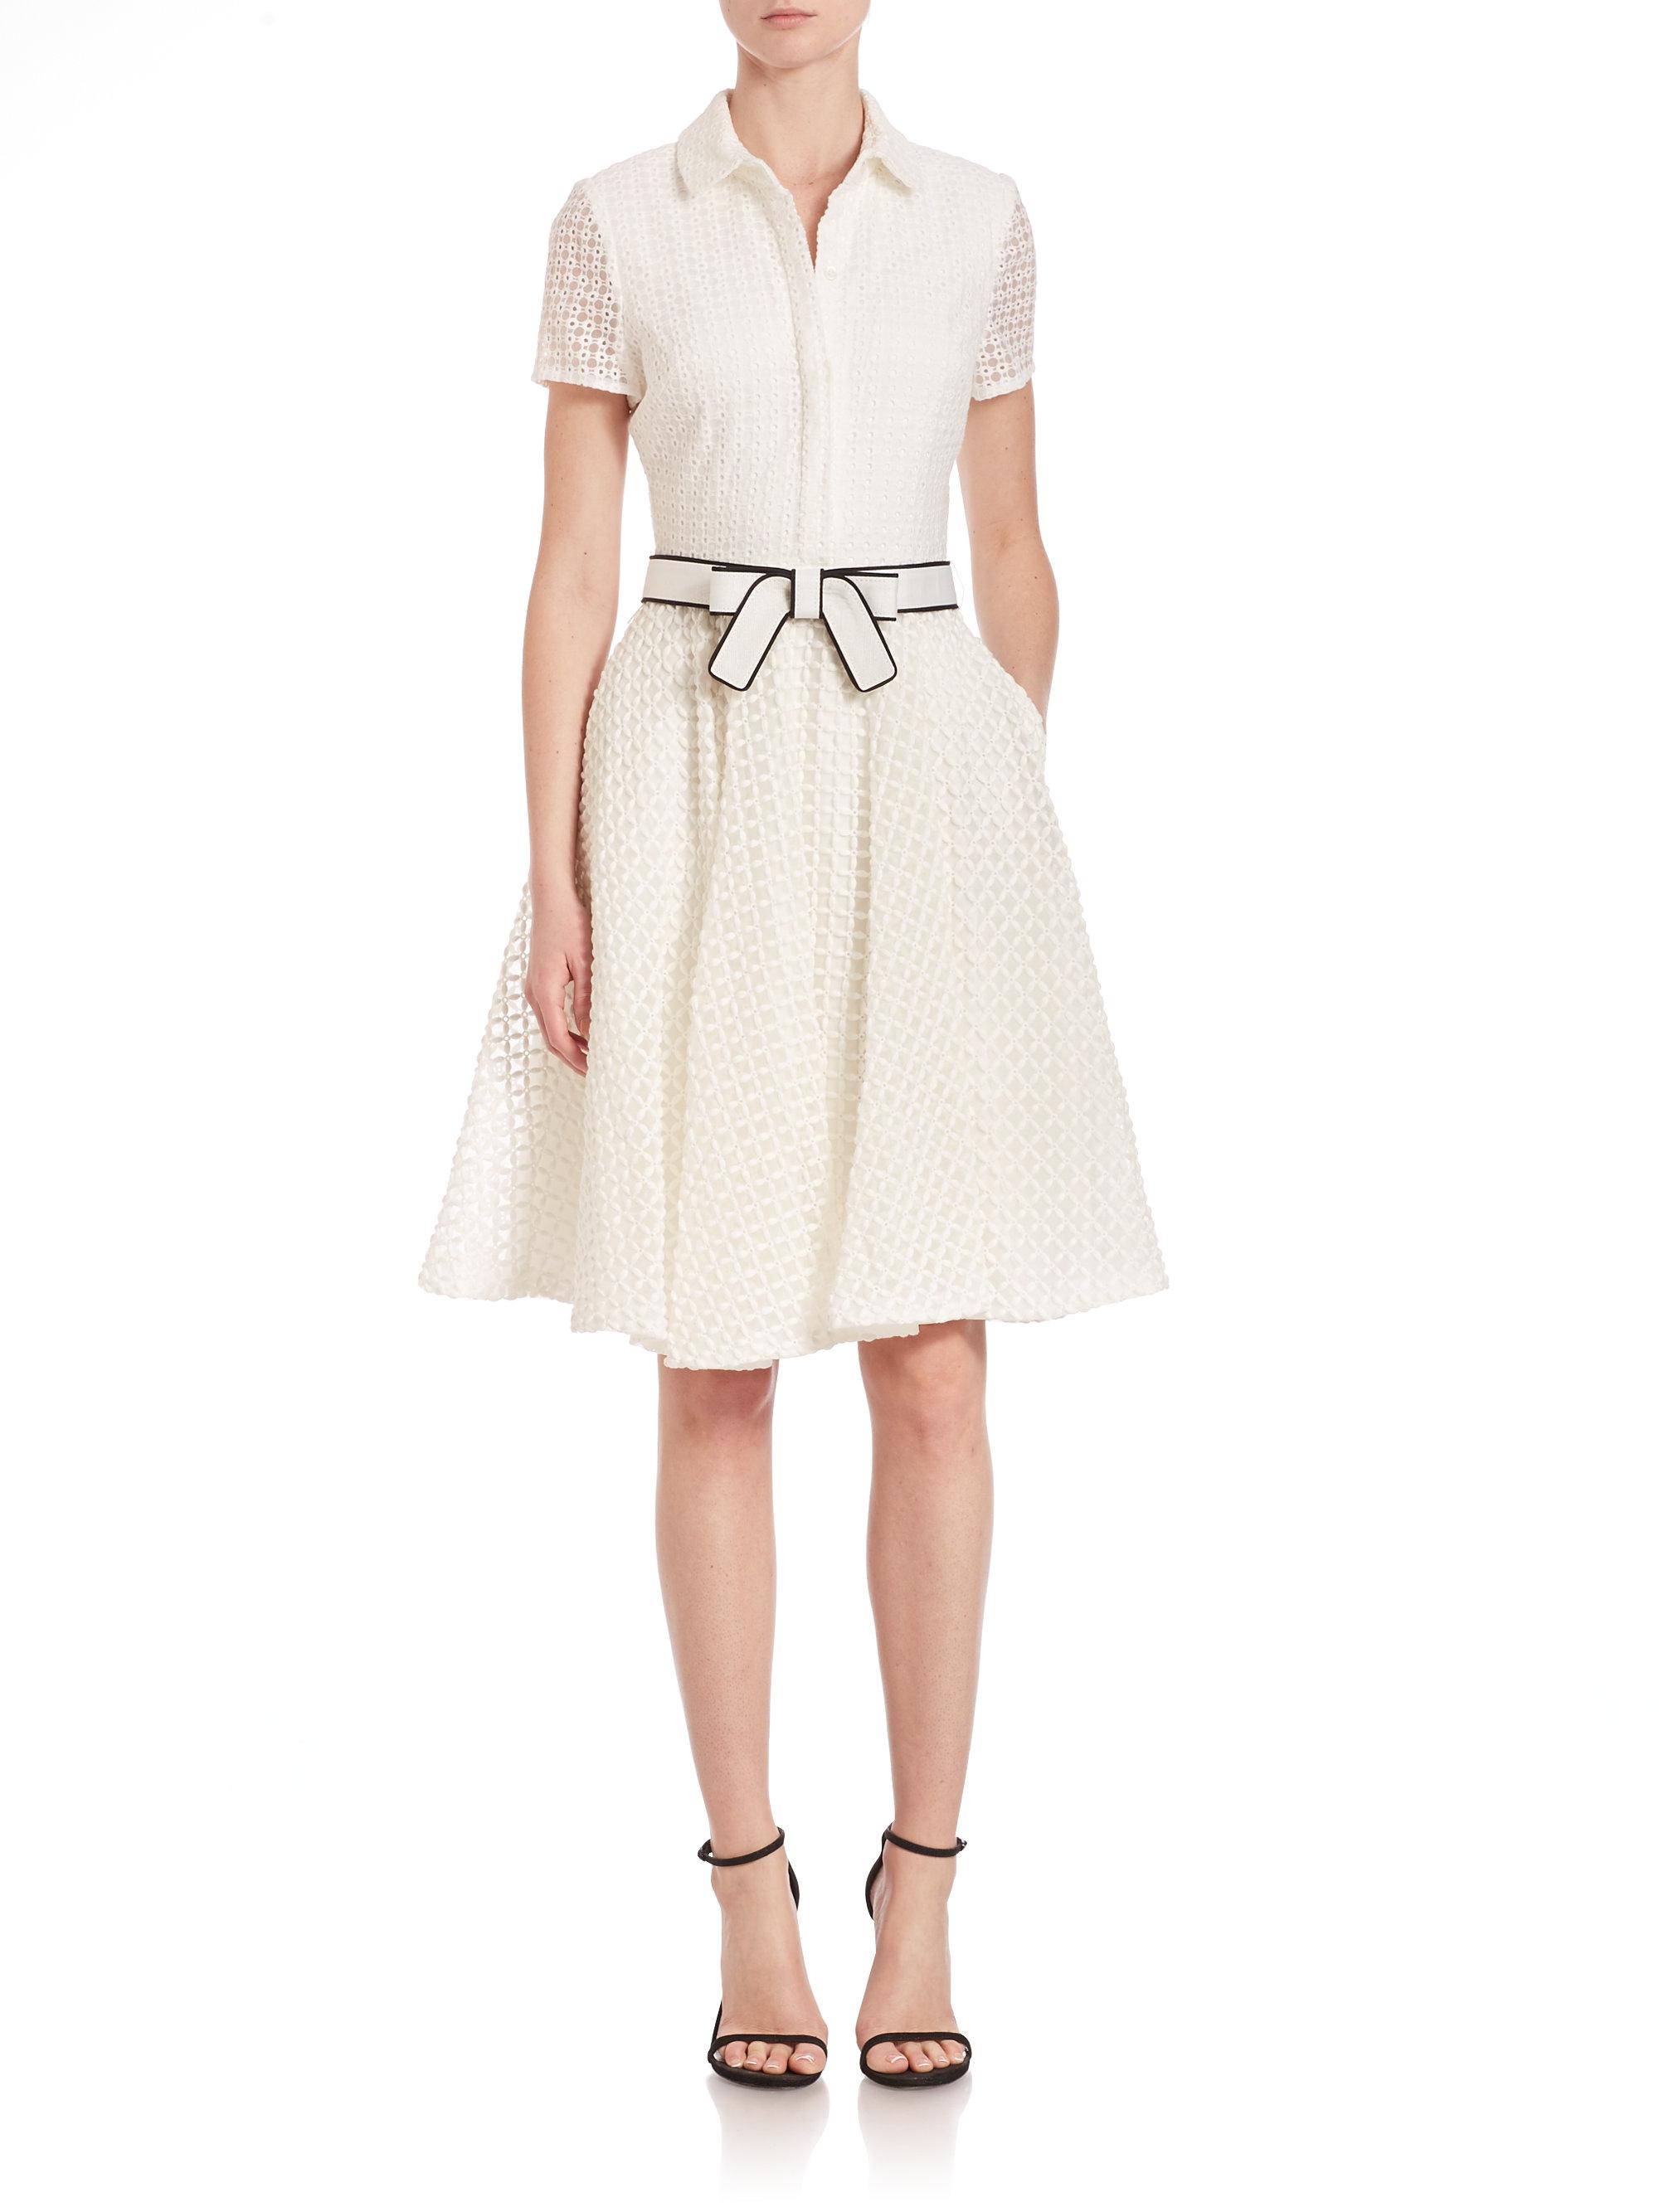 Badgley mischka short sleeve belted shirt dress in white for Short sleeve white dress shirt